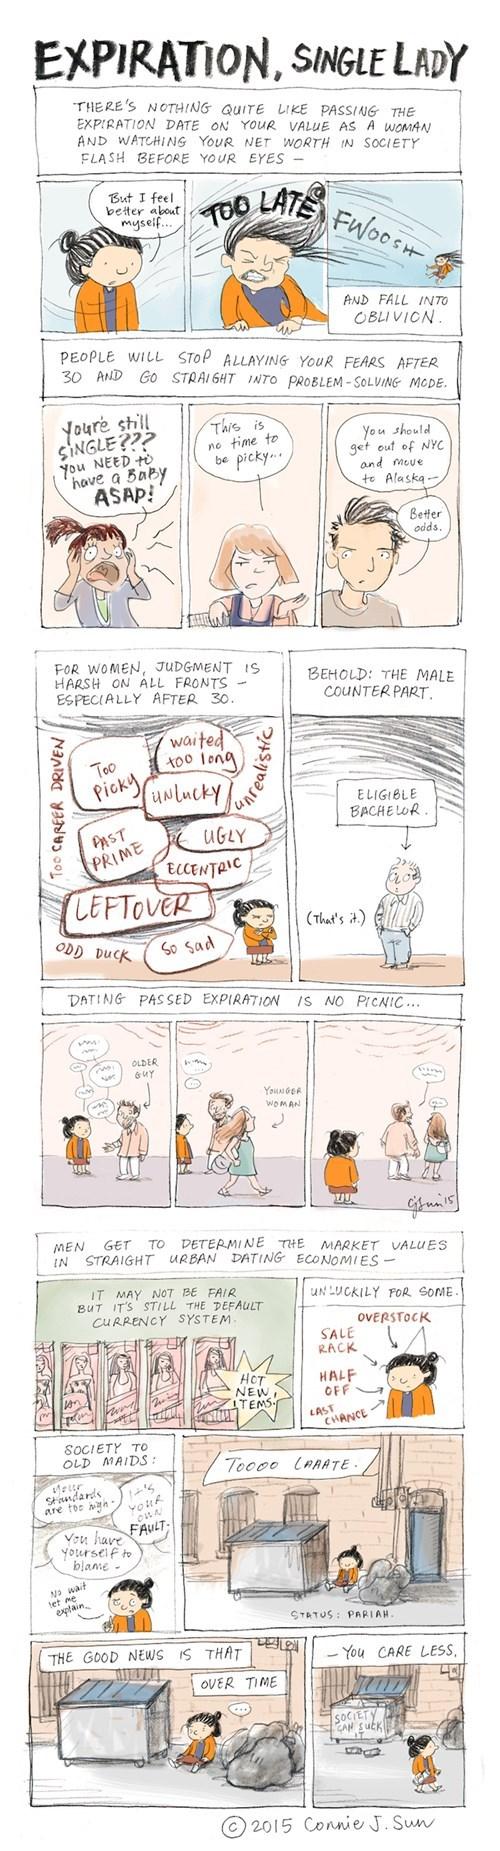 funny-web-comics-datings-expiration-status